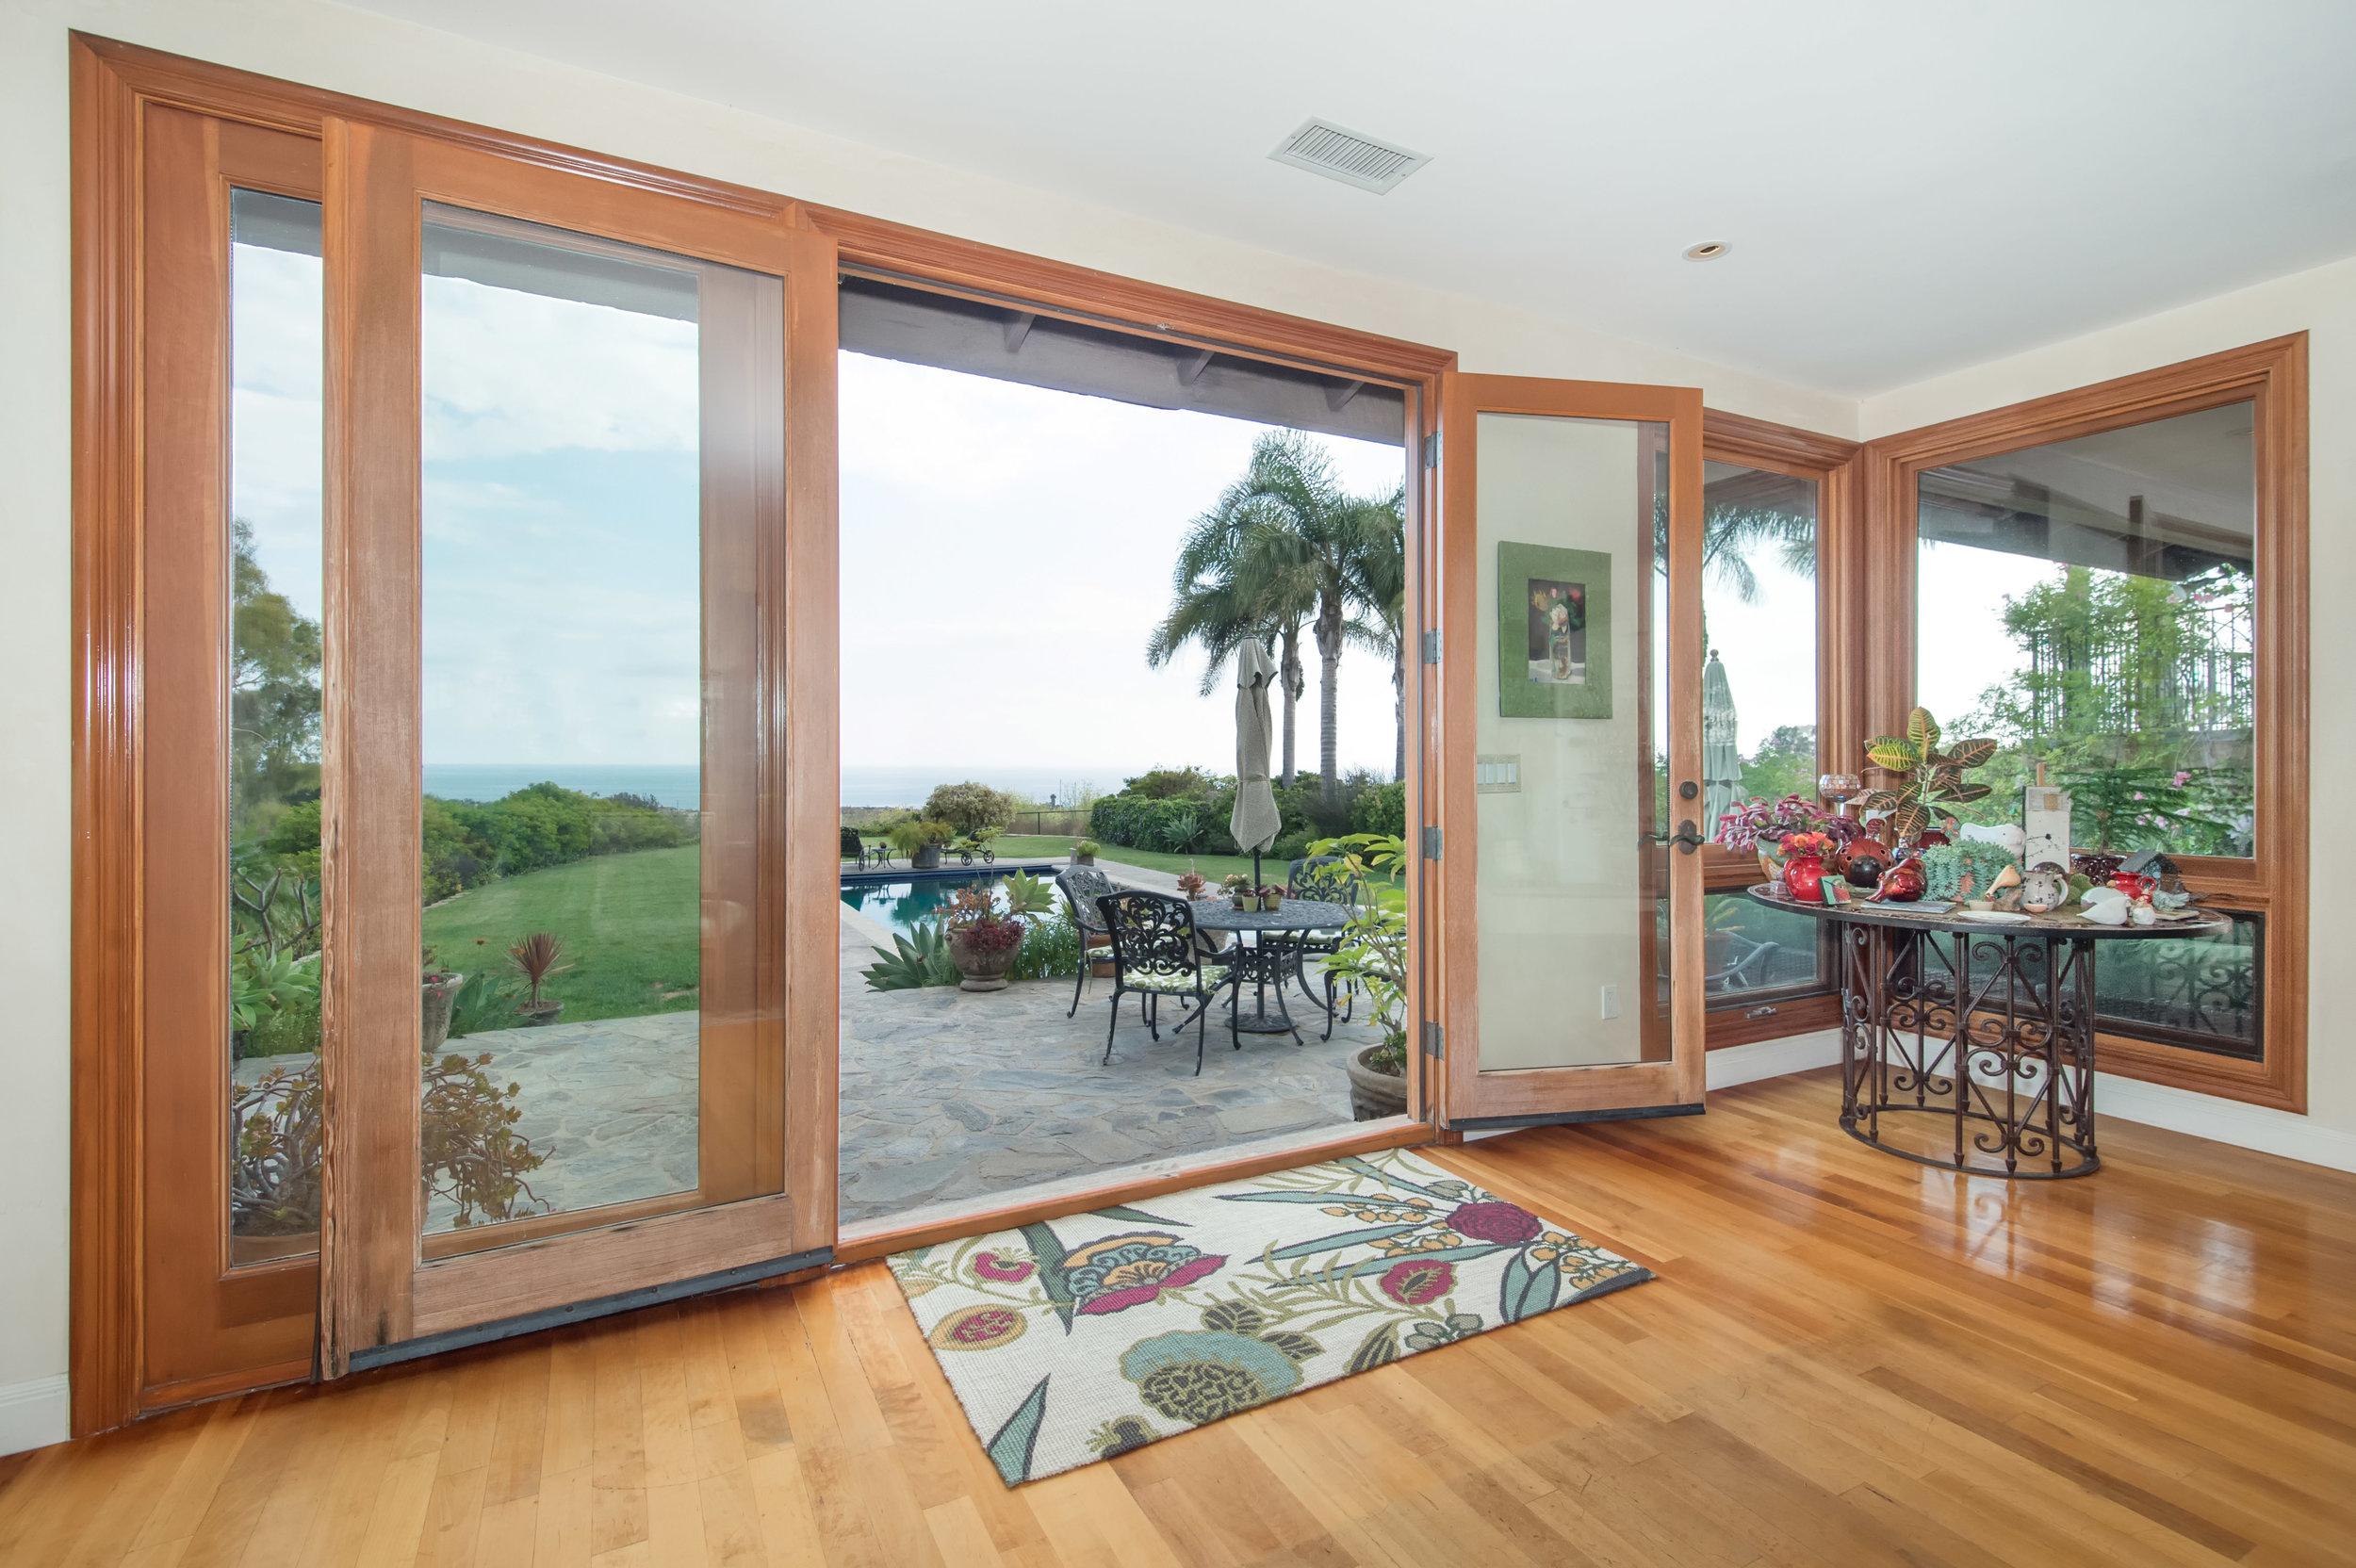 012 living room ocean view 29660 Harvester Road Malibu For Sale The Malibu Life Team Luxury Real Estate.jpg